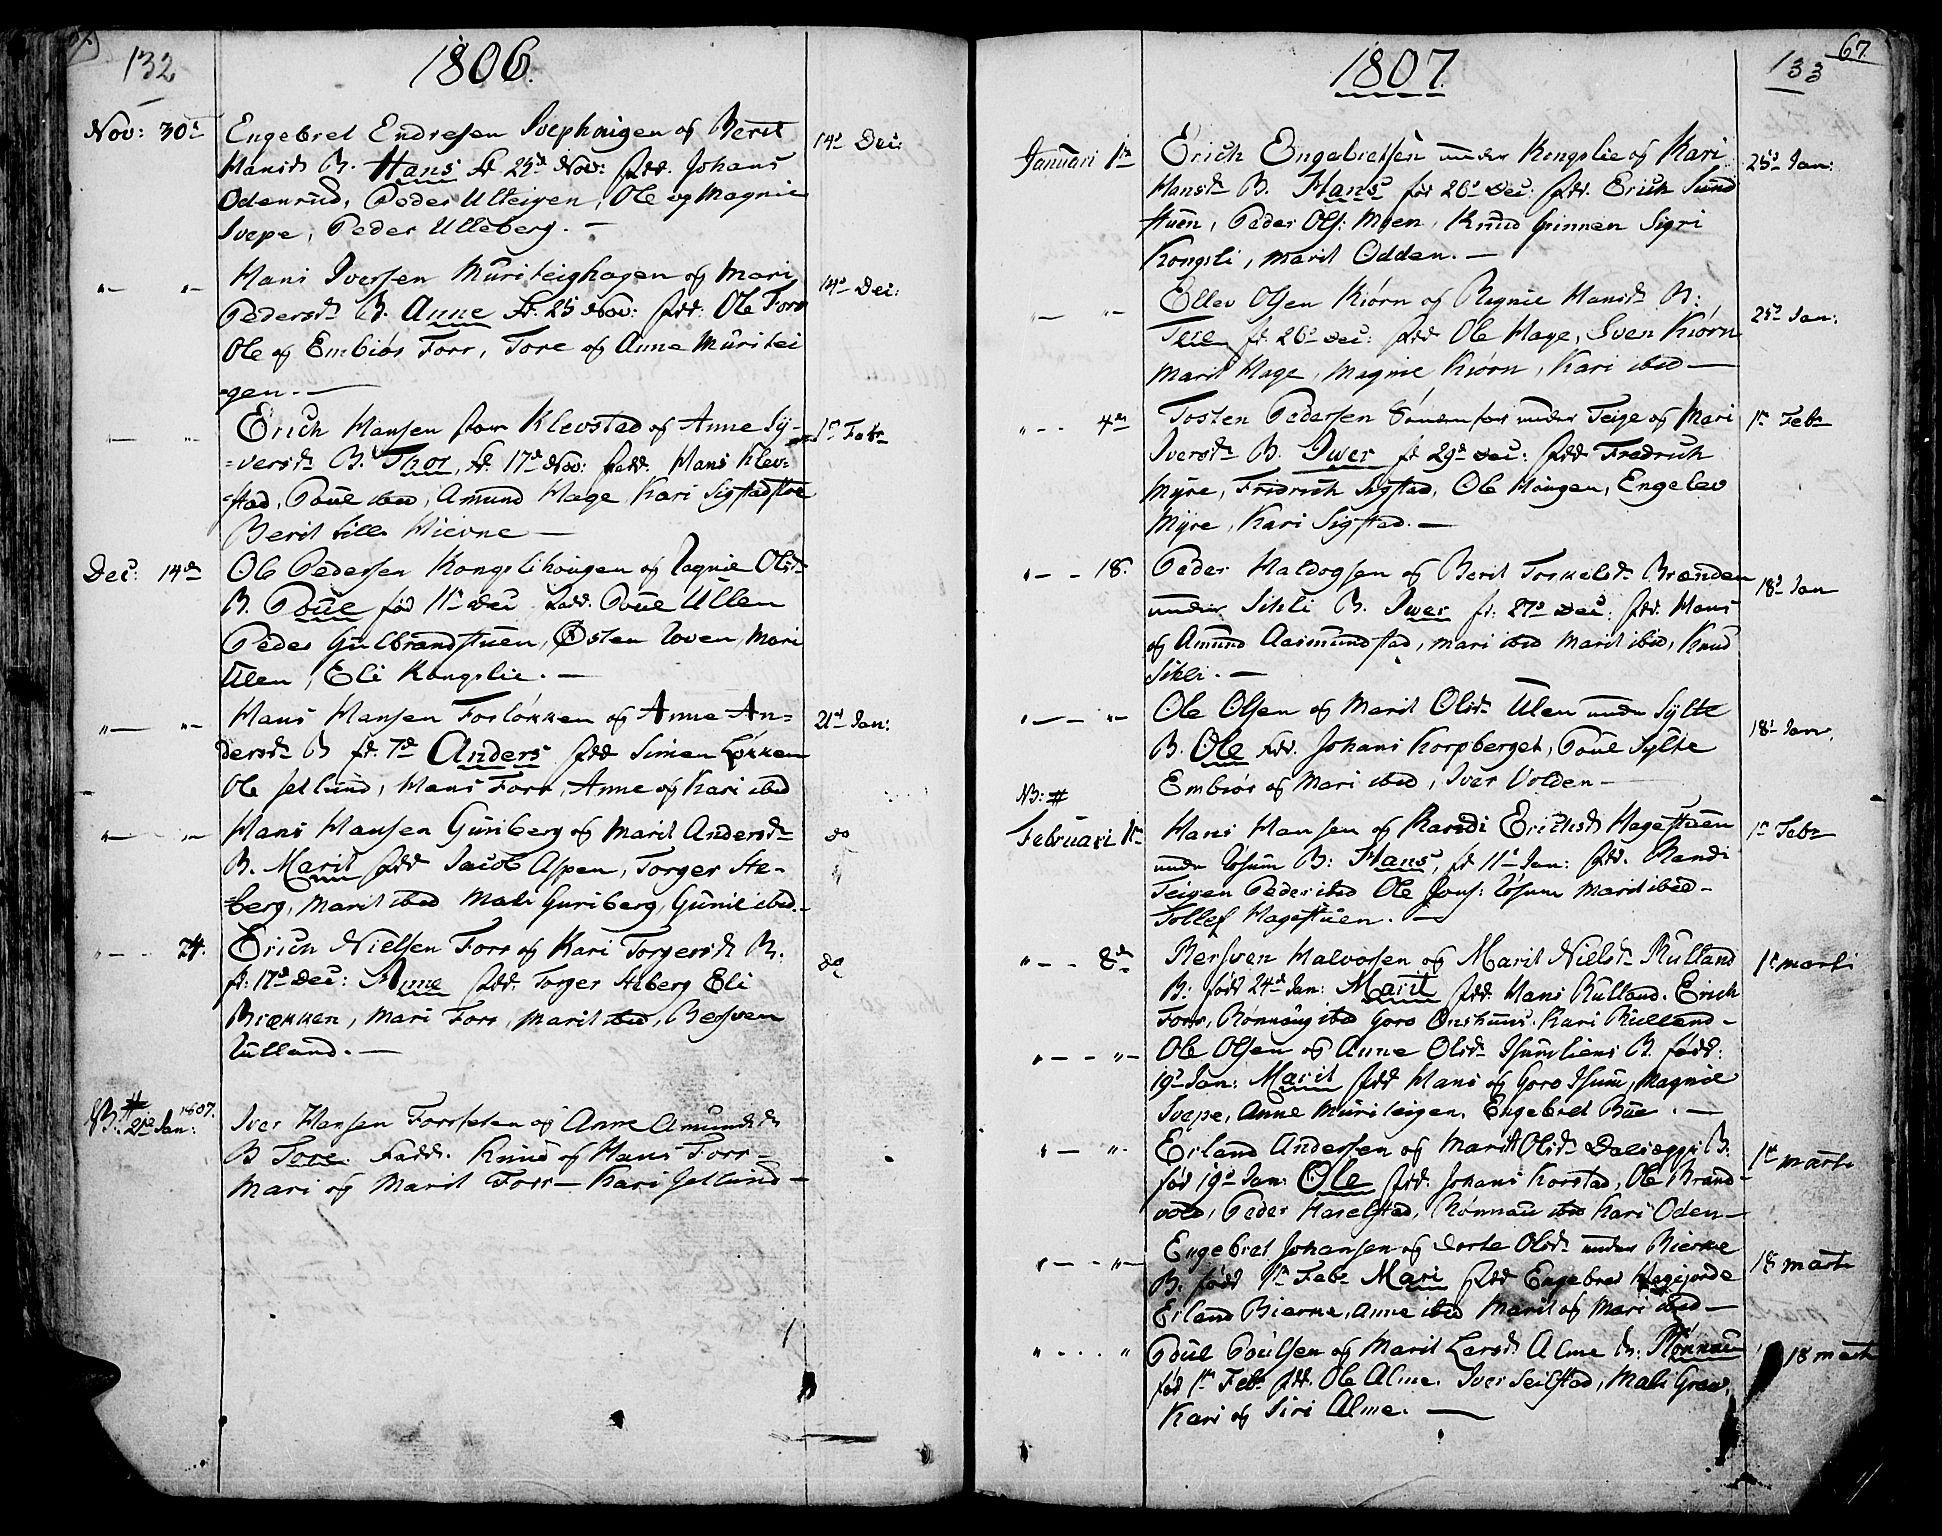 SAH, Fron prestekontor, H/Ha/Haa/L0001: Ministerialbok nr. 1, 1799-1816, s. 132-133